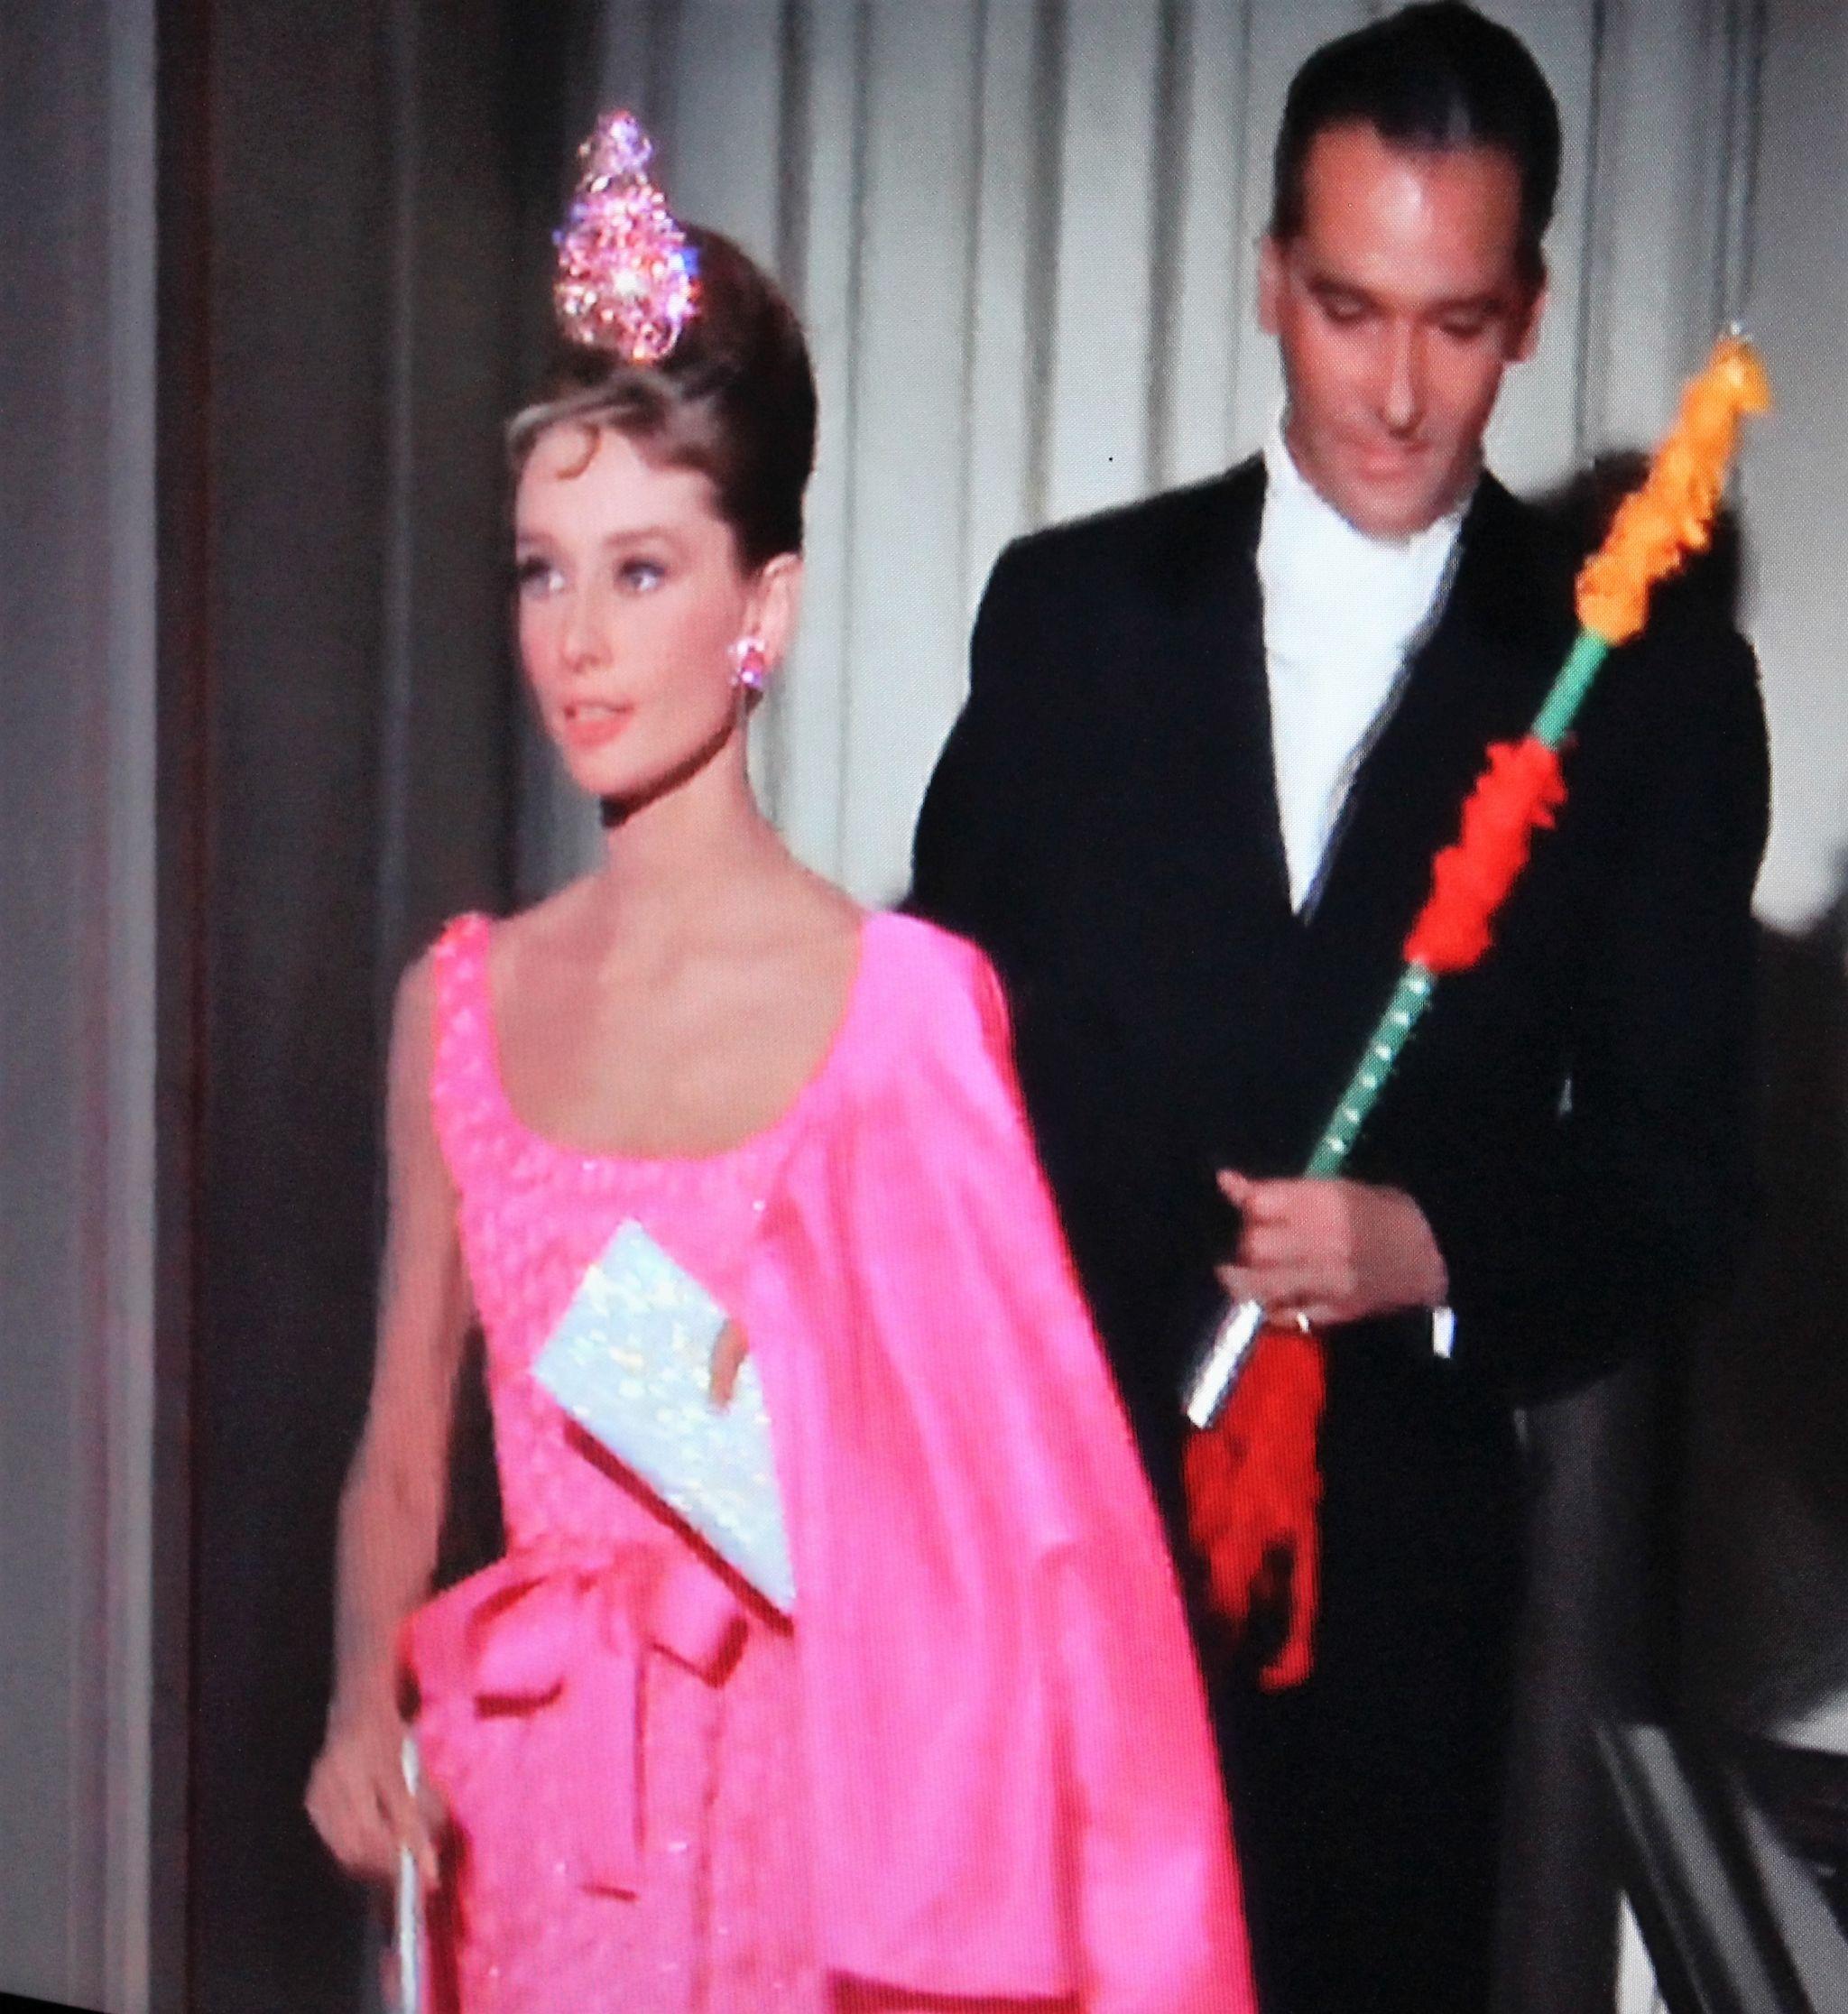 Breakfast at Tiffany's Audrey Hepburn pink dress